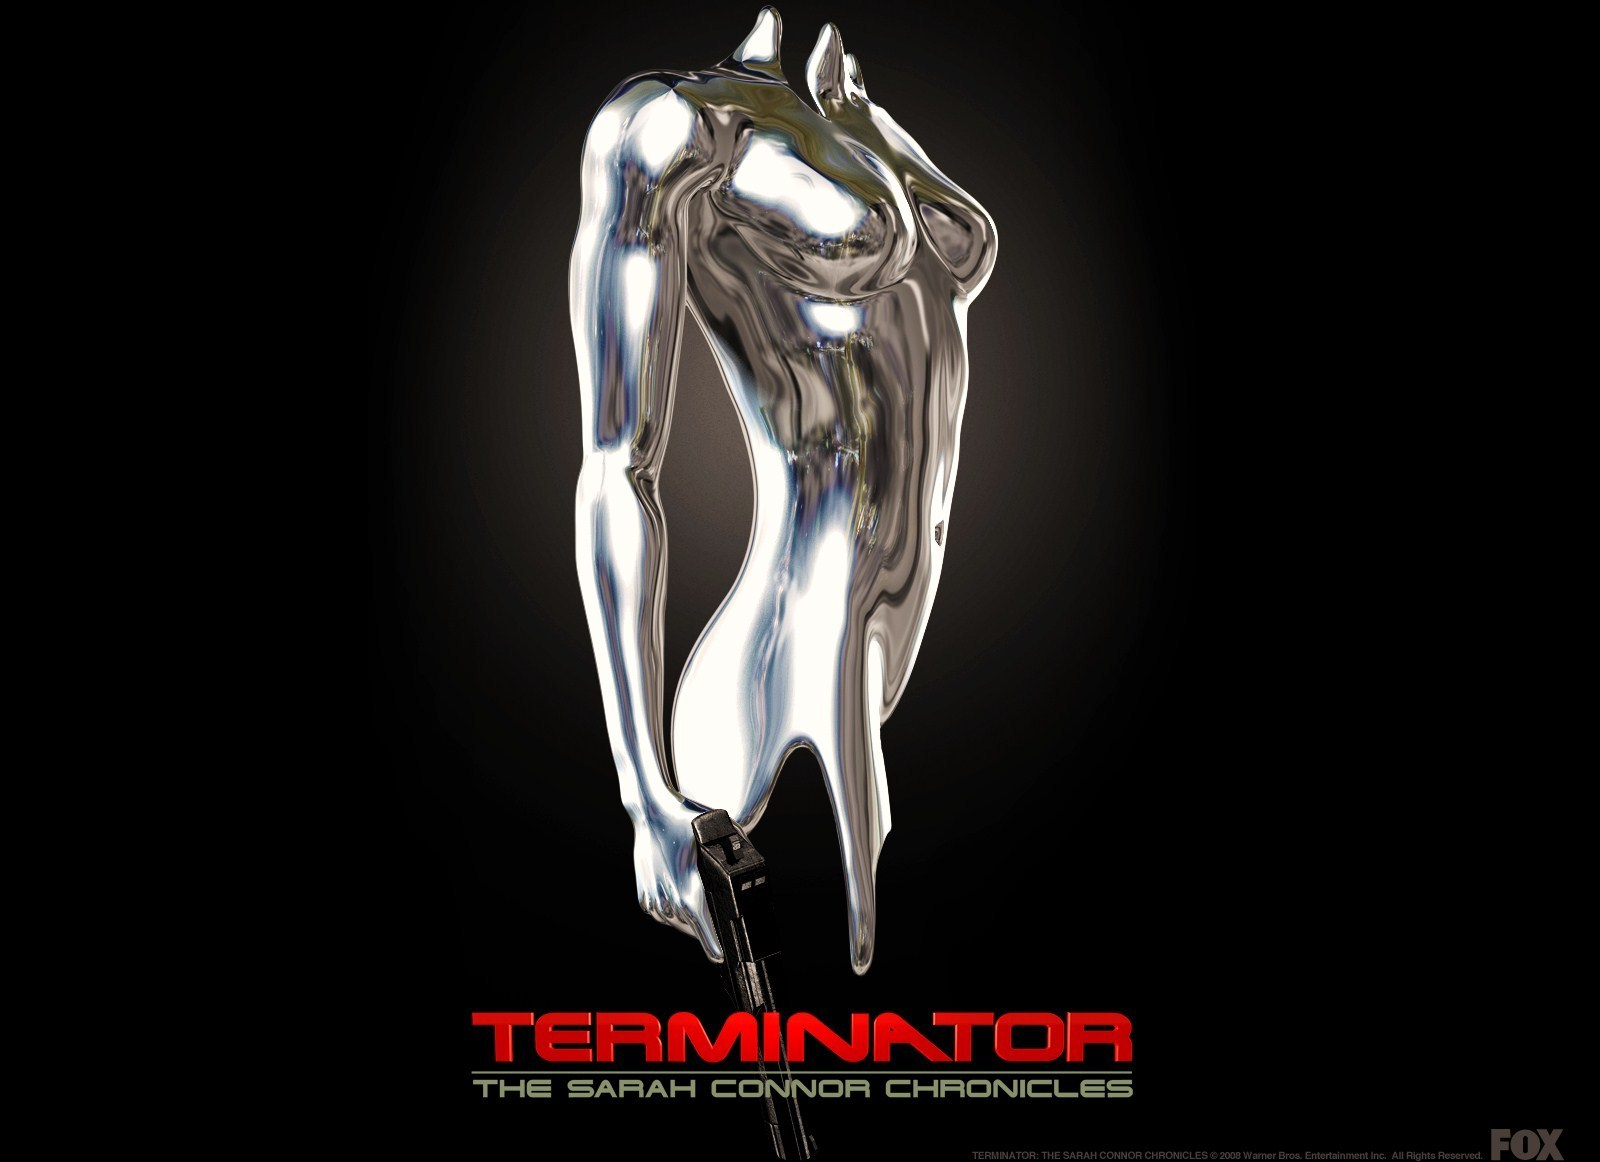 terminator the sarah chronicles wallpaper Buy terminator: the sarah connor chronicles season 1: read 912 movies & tv reviews - amazoncom.